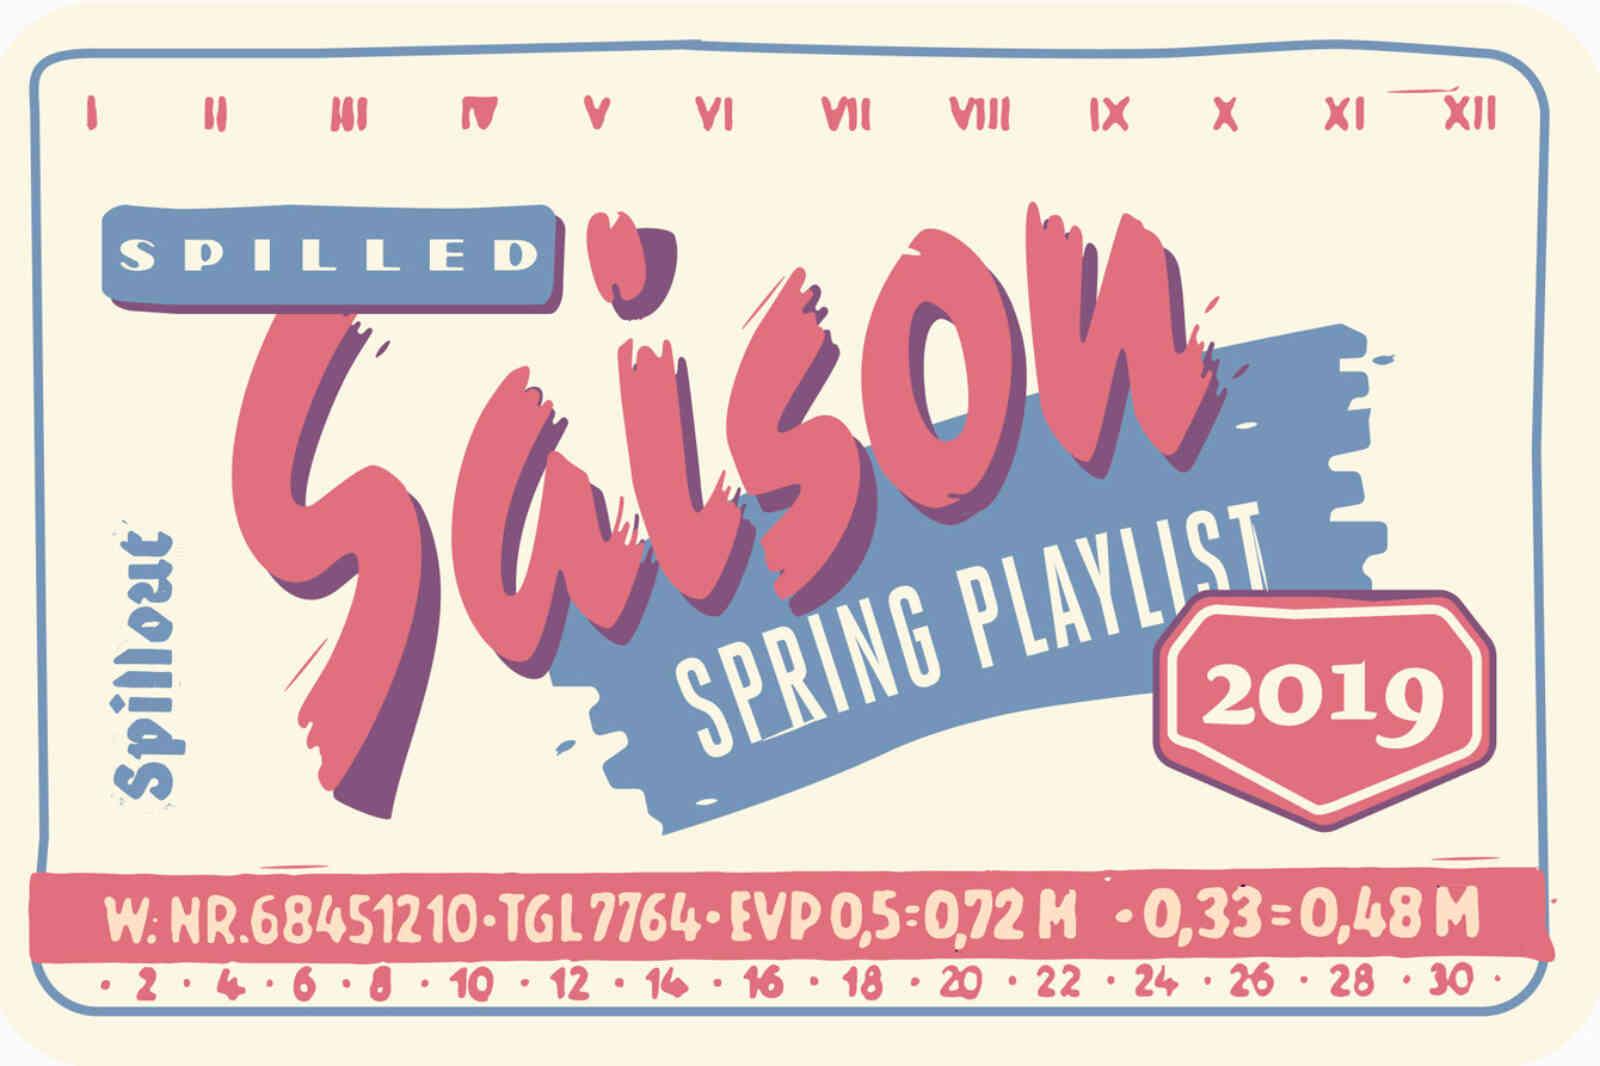 Playlist Spring Spilled Saison